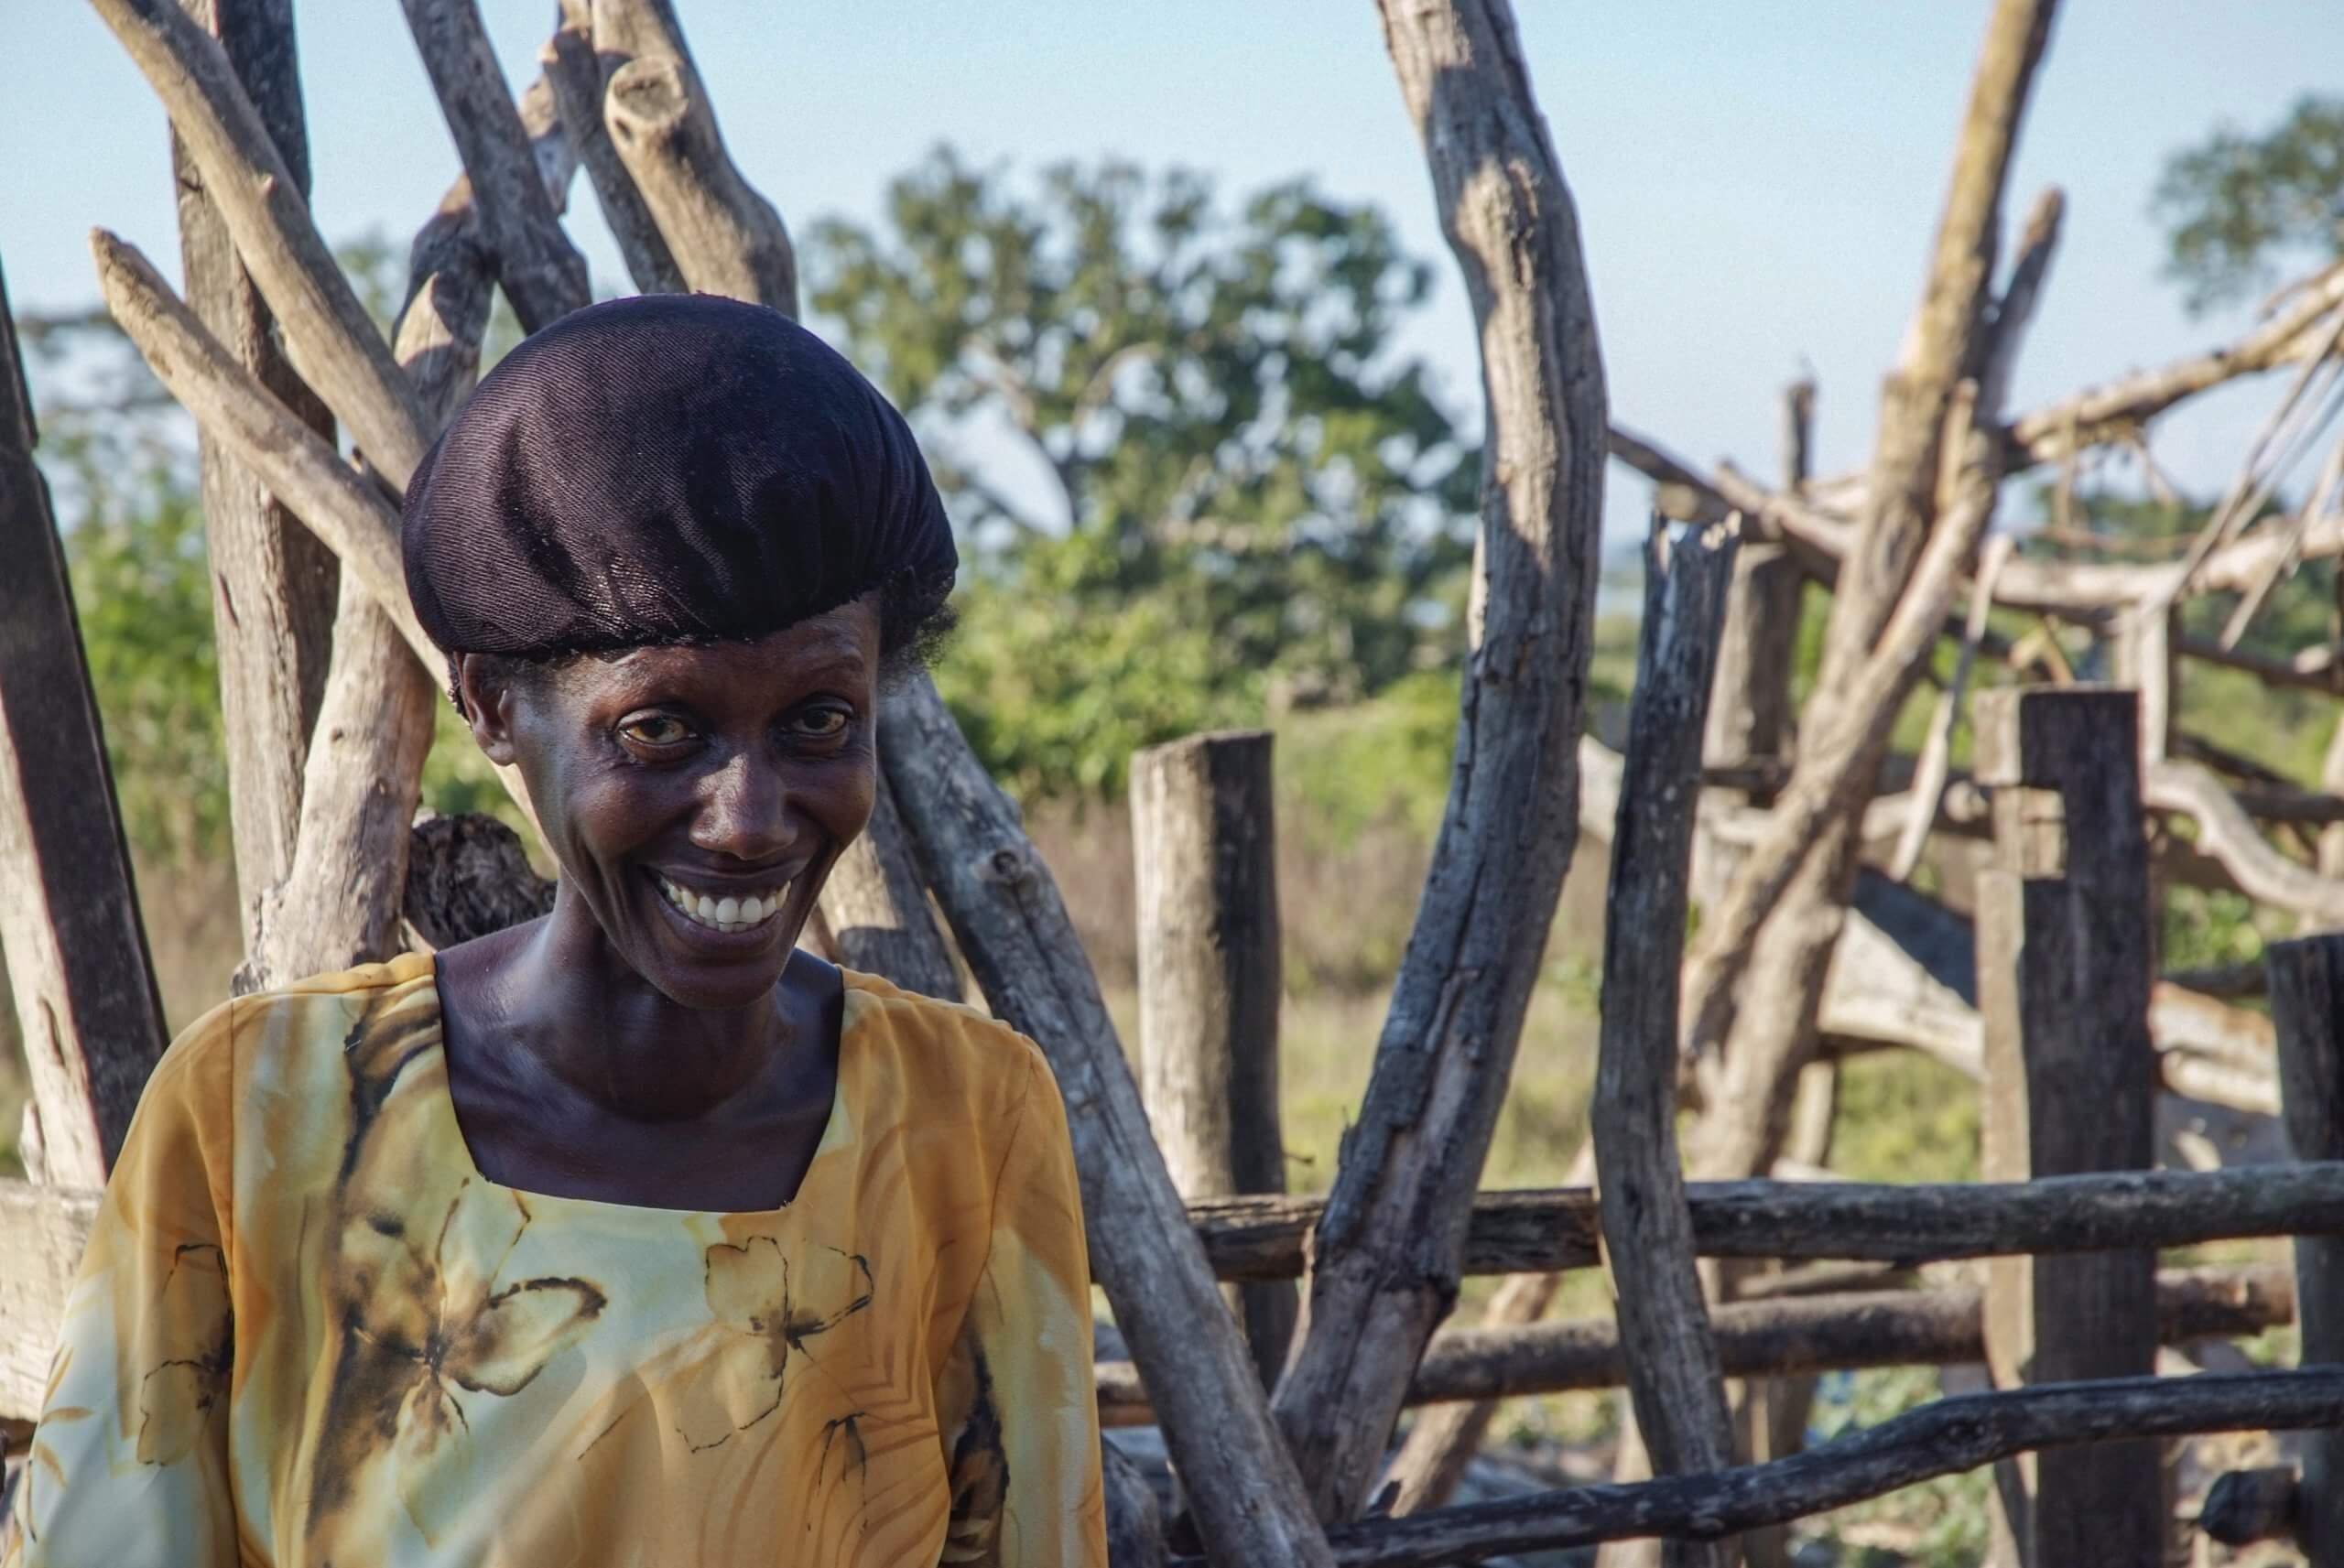 11 01 boerin trotsevrouwen Florence C Mokiwa Tanga Tanzania 4025 scaled